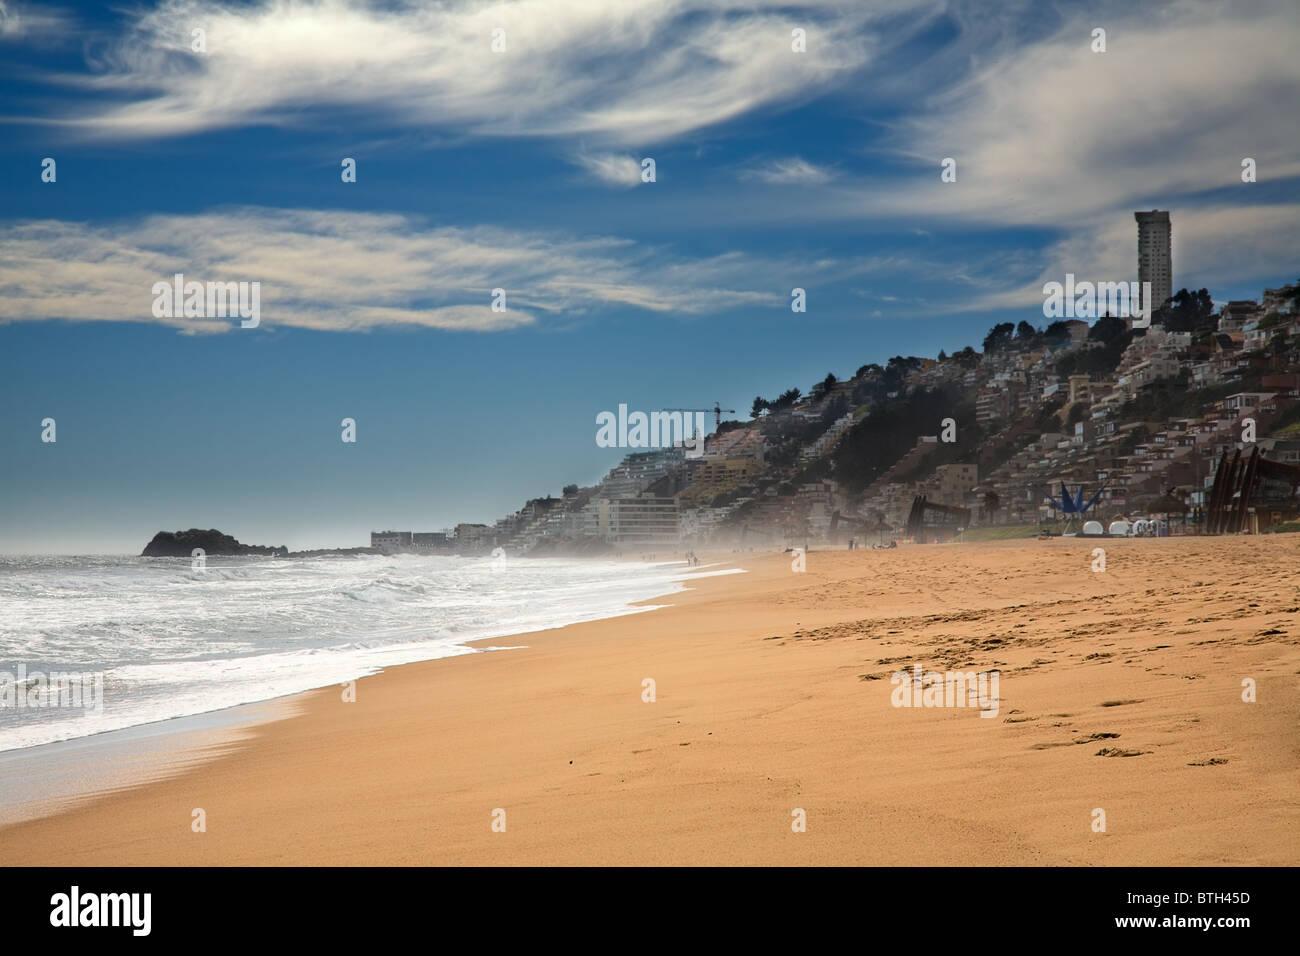 beach at Vina del Mar, Chile - Stock Image